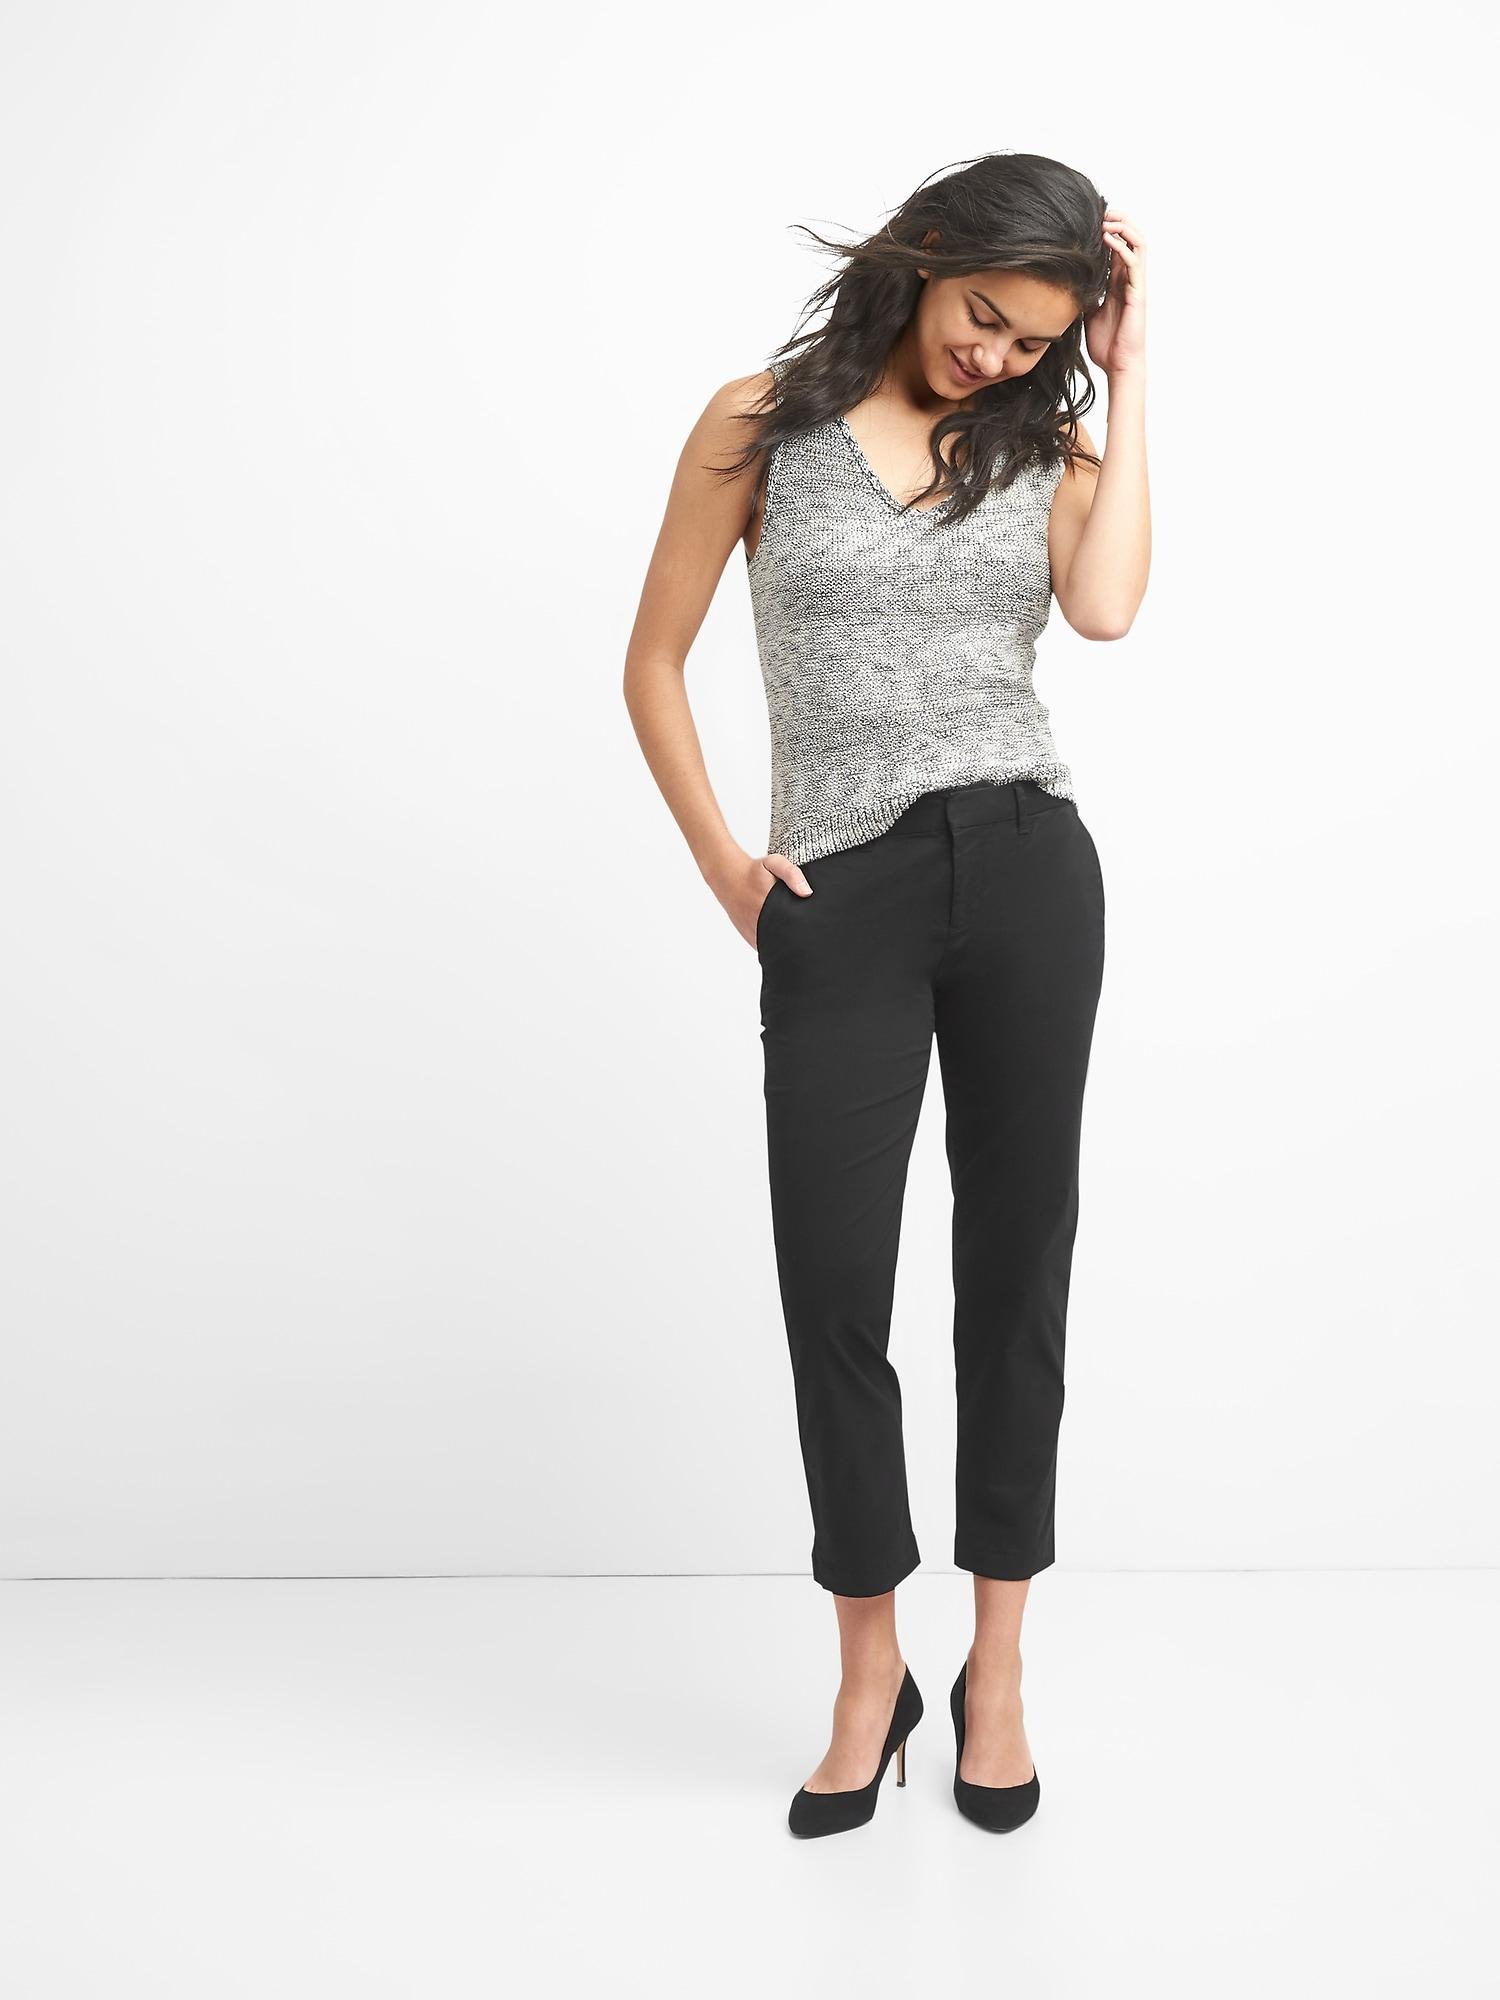 Gap Women/'s Black Slim City Crop Chinos Size 6 Petite